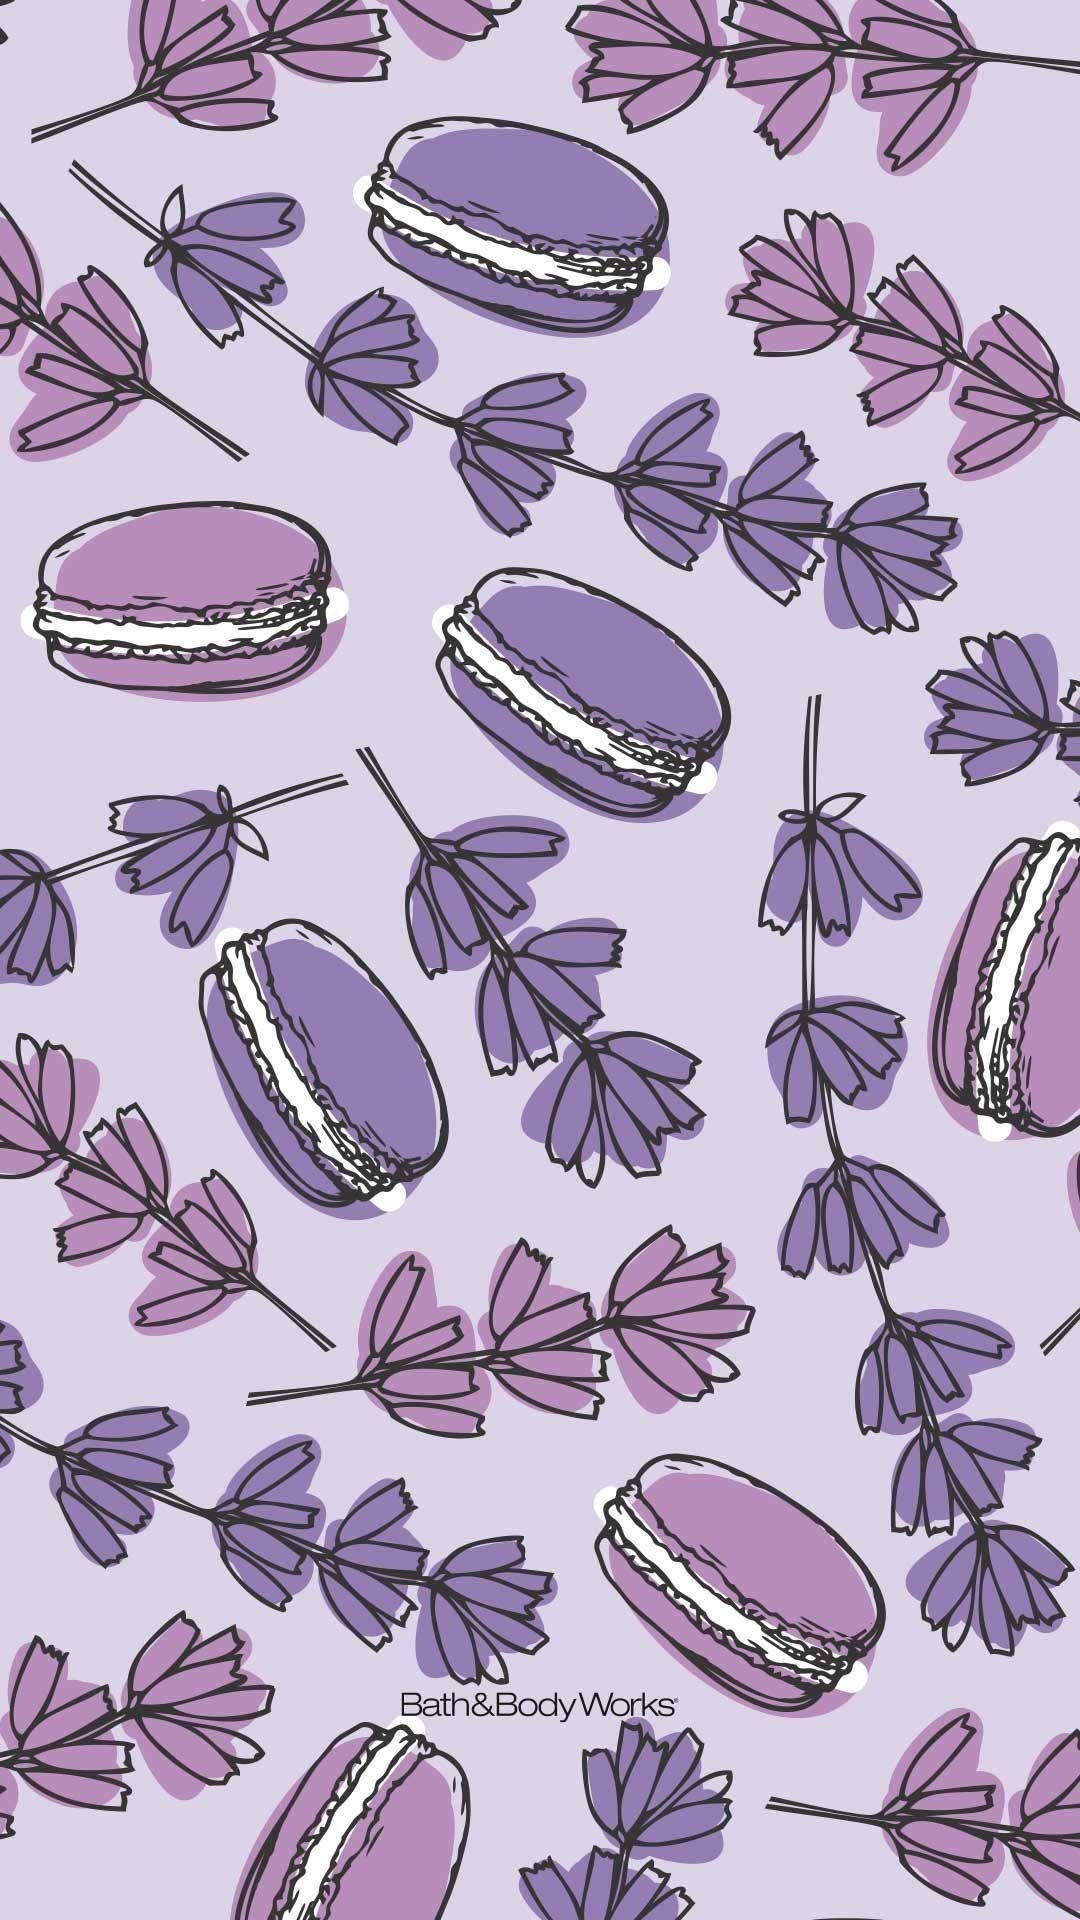 Pin Auf Dem Ipad Sperrbildschirm Purple Wallpaper Iphone Cute Patterns Wallpaper Aesthetic Iphone Wallpaper